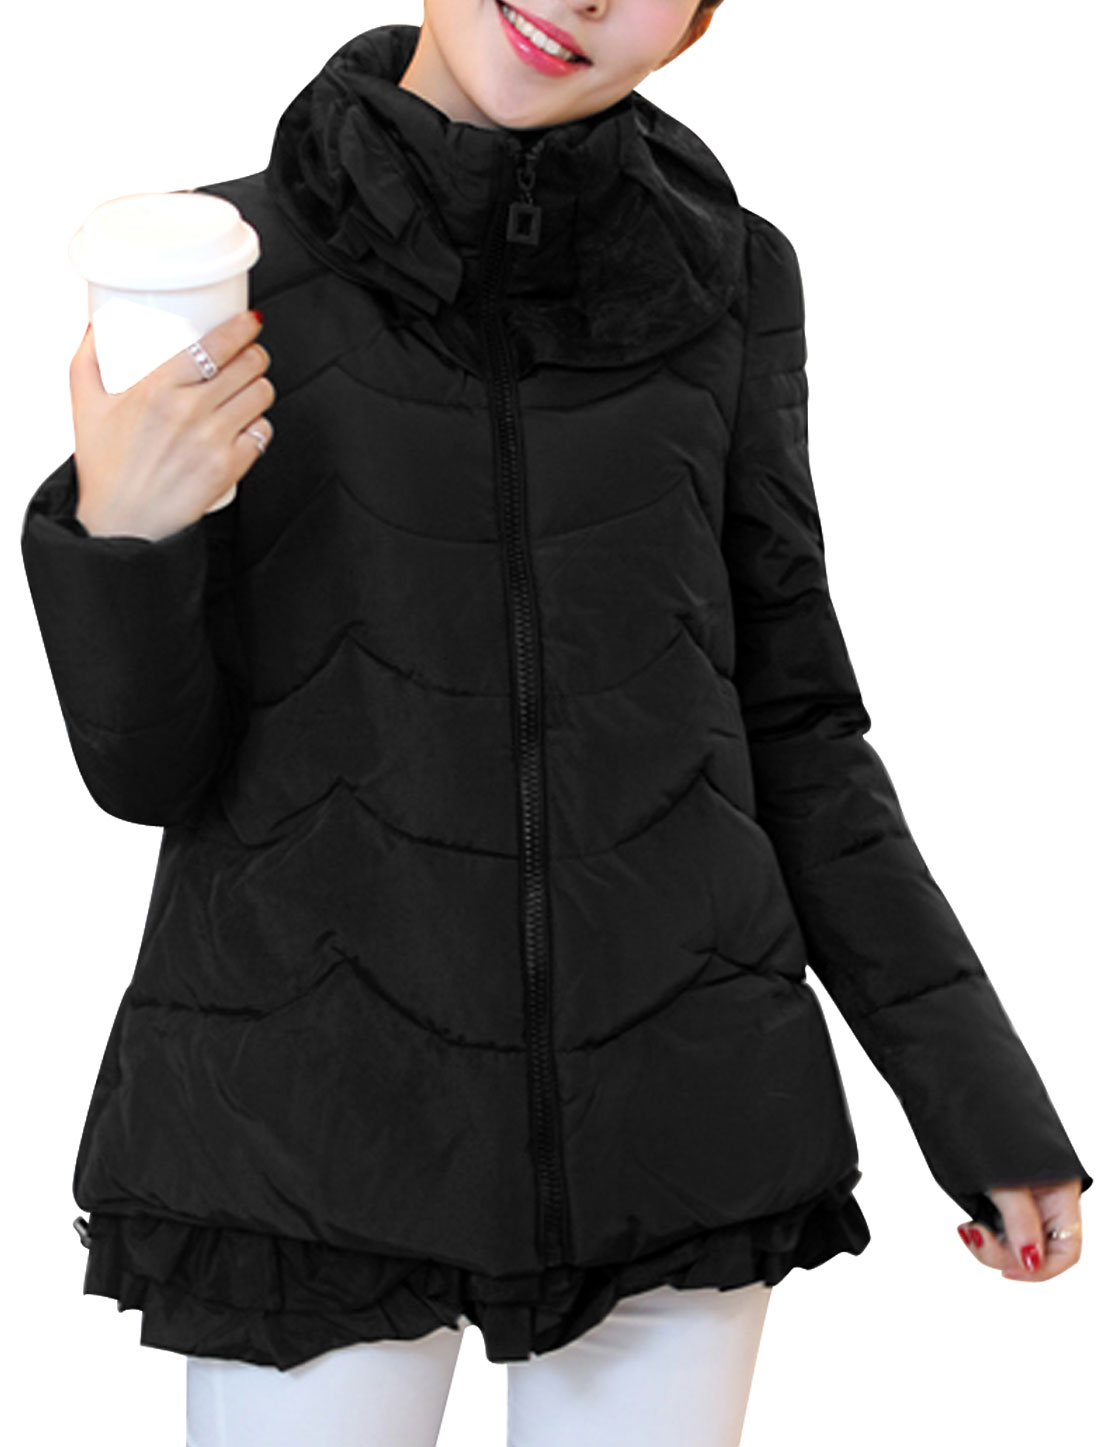 Lady Convertible Collar Zip Up Side Pockets Ruffles Hem Down Jacket Black M